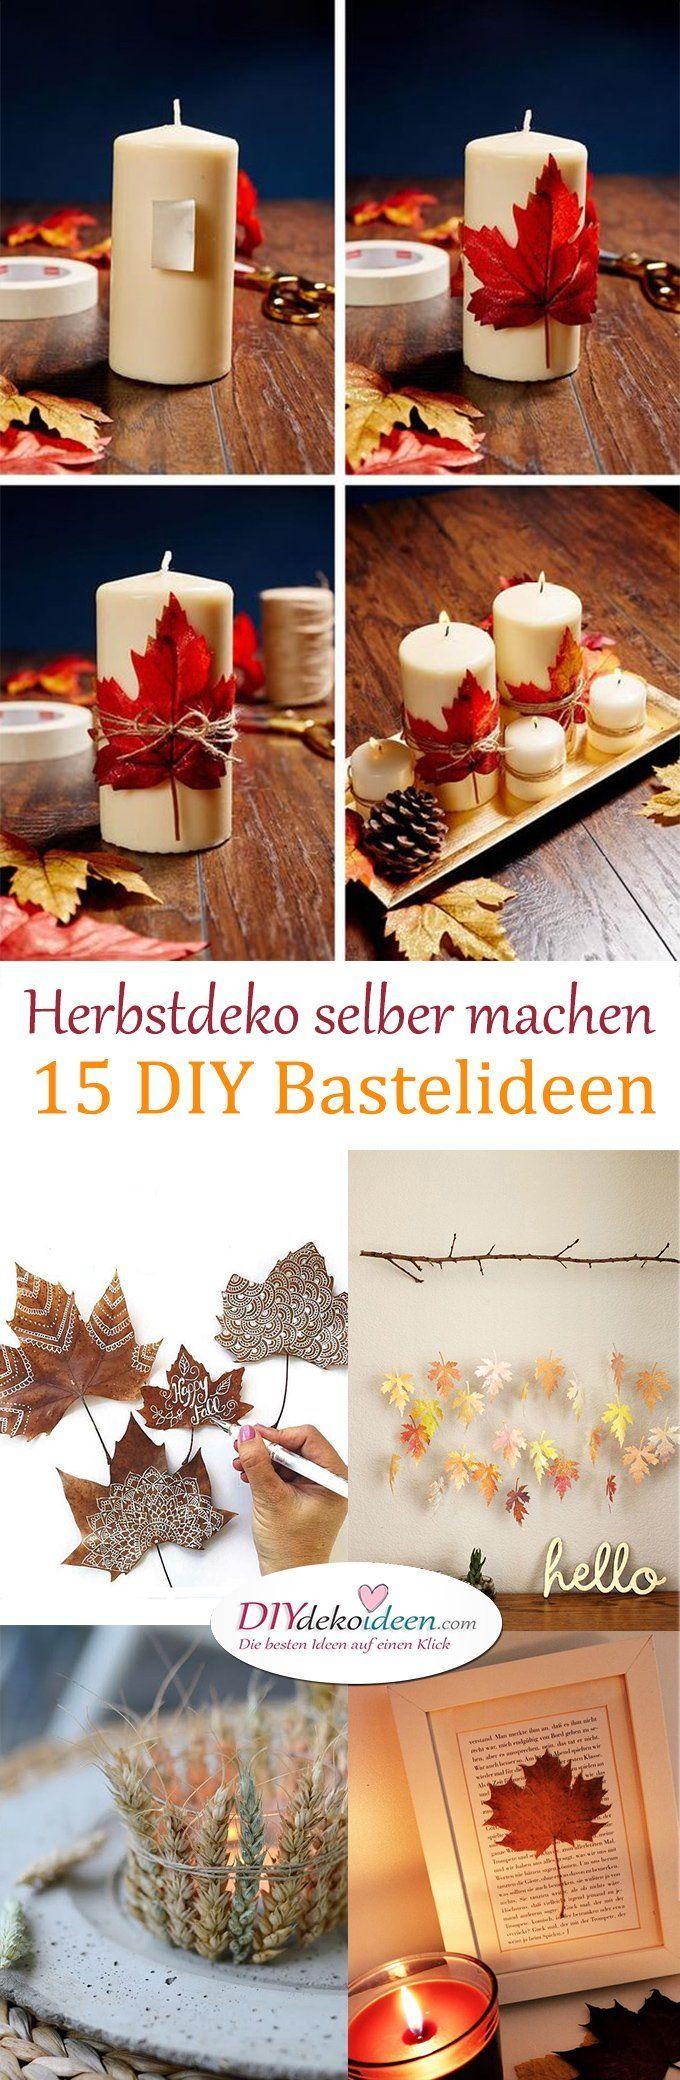 Herbstdekoration selber machen – 15 Bastelideen